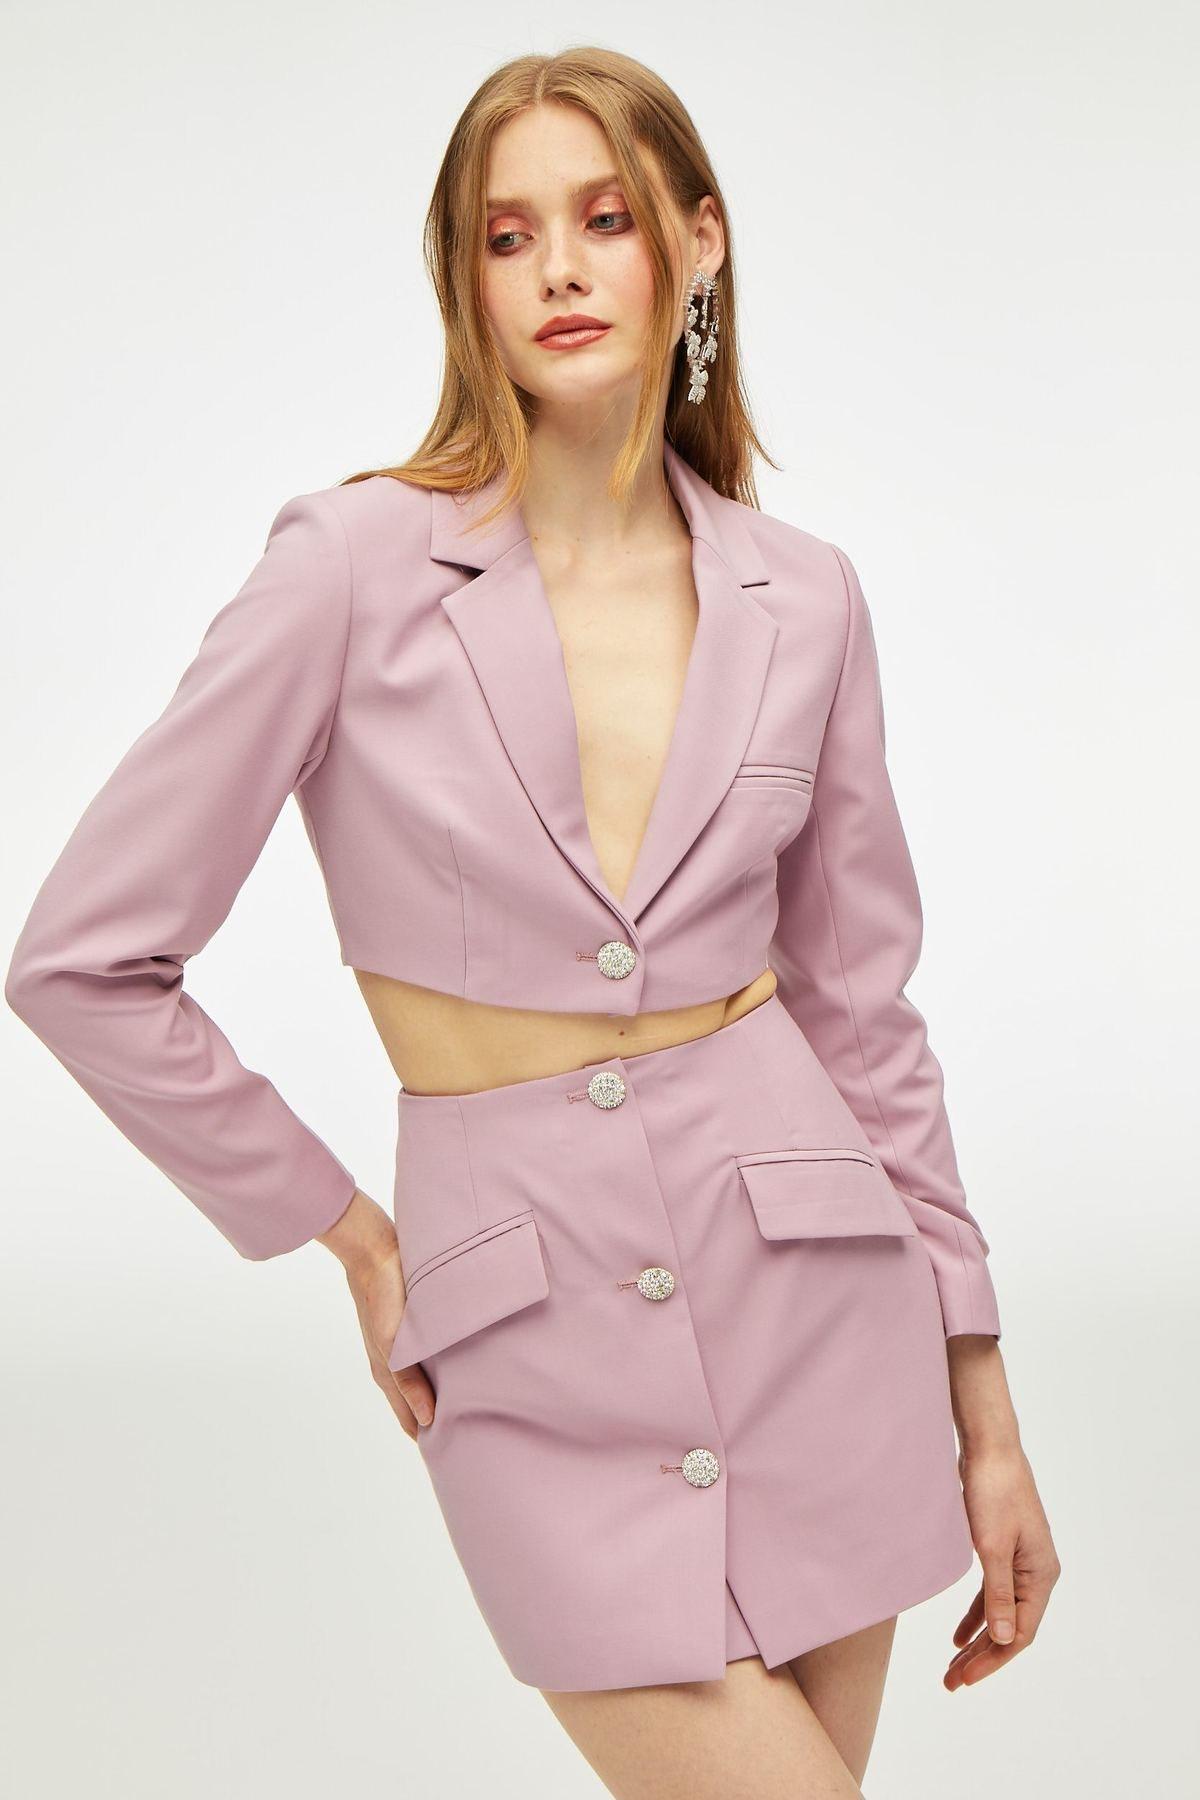 Pink Stella mini blazer set from Nana Jacqueline.